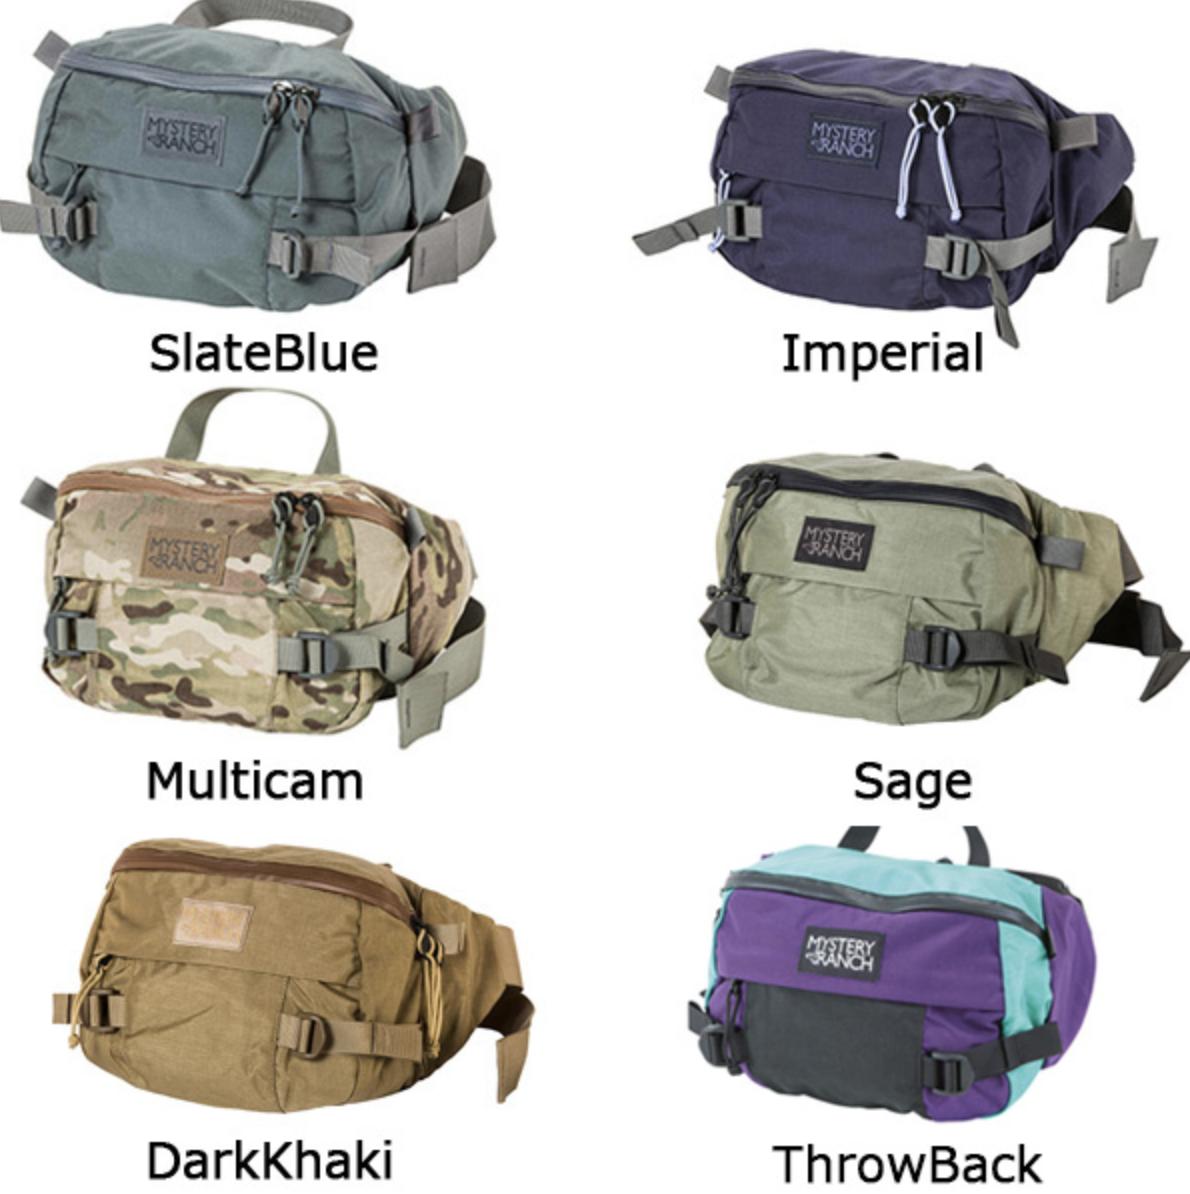 f:id:thebackpack:20190317114107p:plain